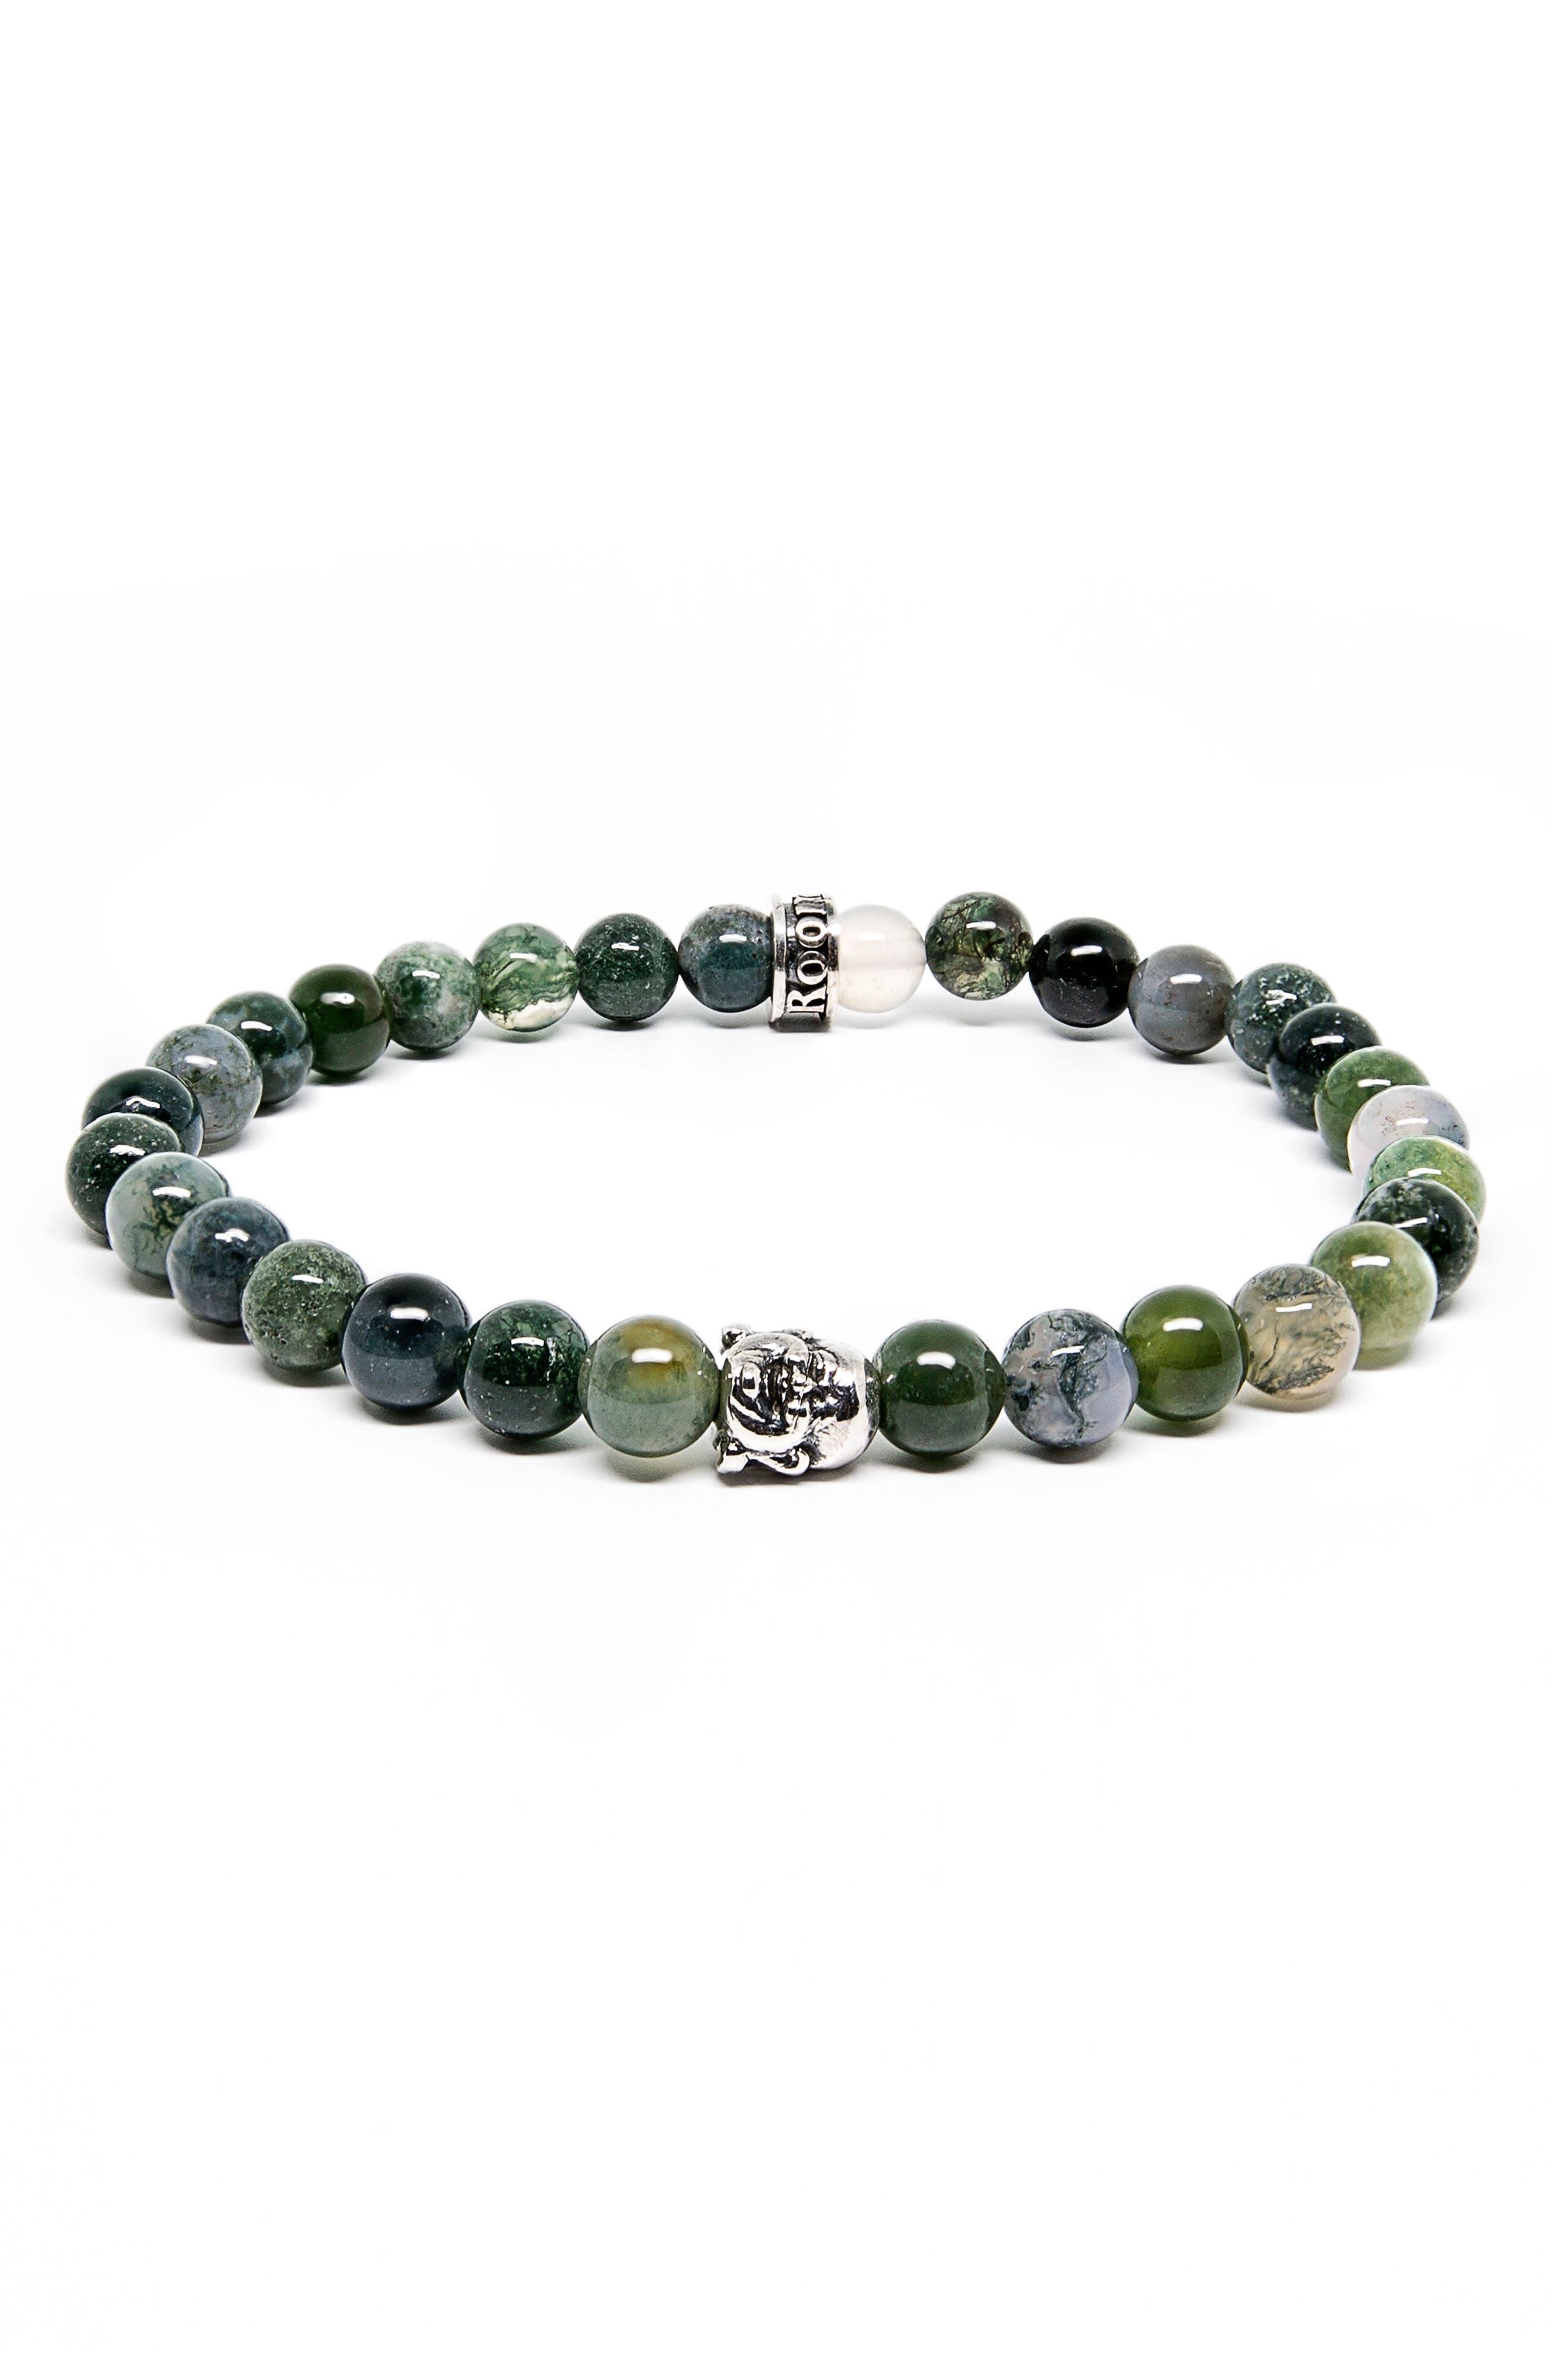 Moss Agate Buddha Stretch Bracelet,                             Main thumbnail 1, color,                             Green